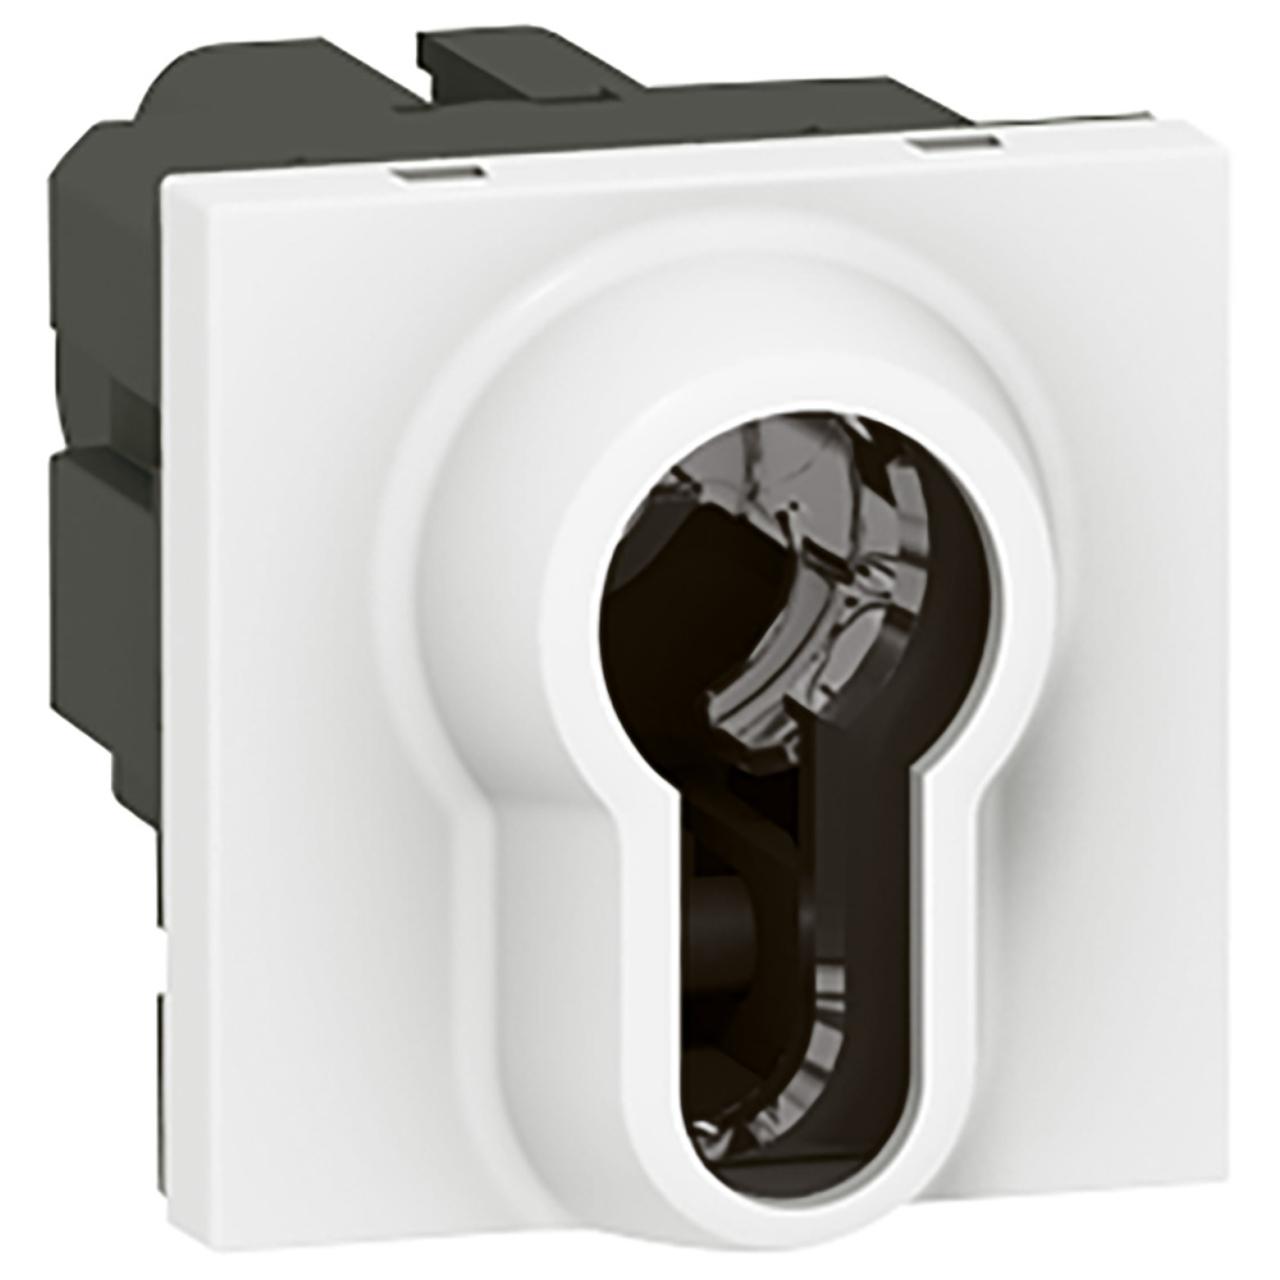 interrupteur cl 3 positions legrand mosaic 74 00. Black Bedroom Furniture Sets. Home Design Ideas